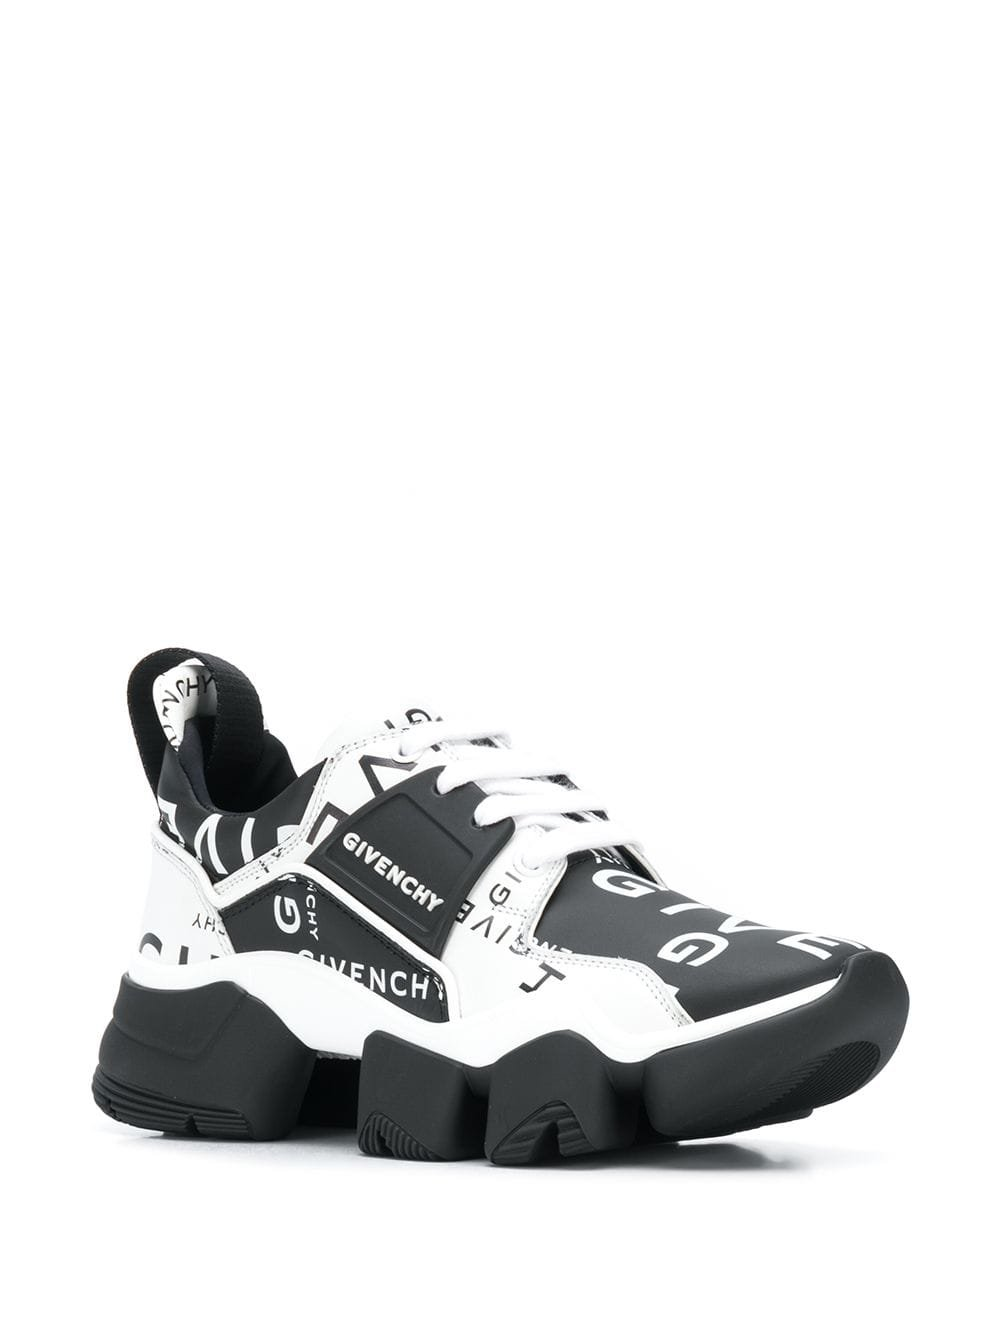 Givenchy Jaw Logo Chunky Sneakers   Farfetch.com